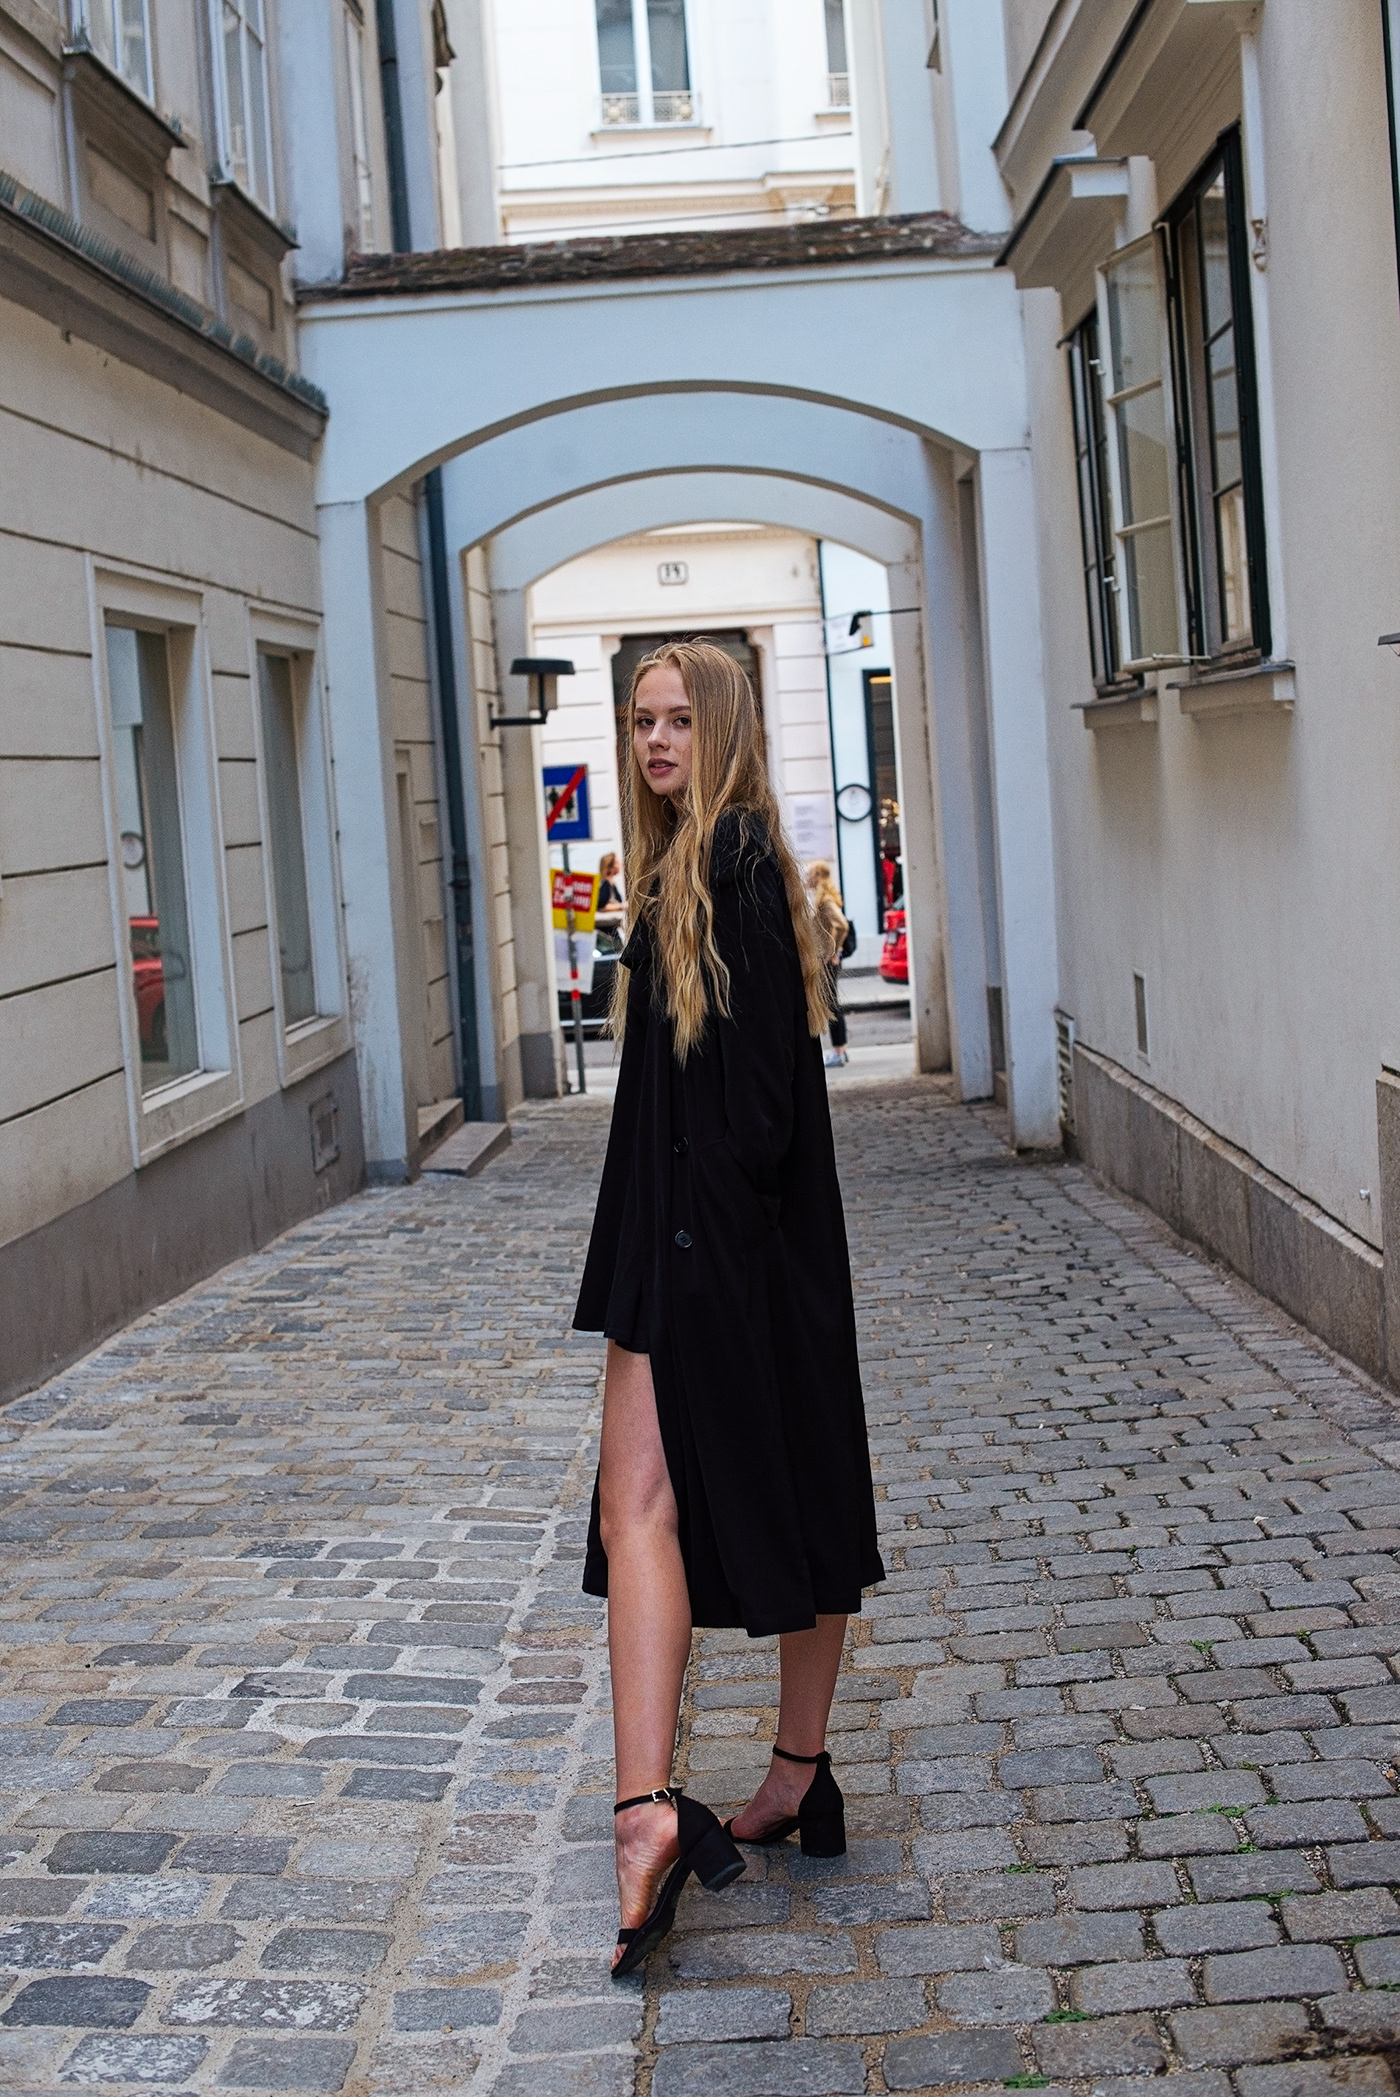 model vienna Model Agency Fashion  portrait Photography  blonde girl